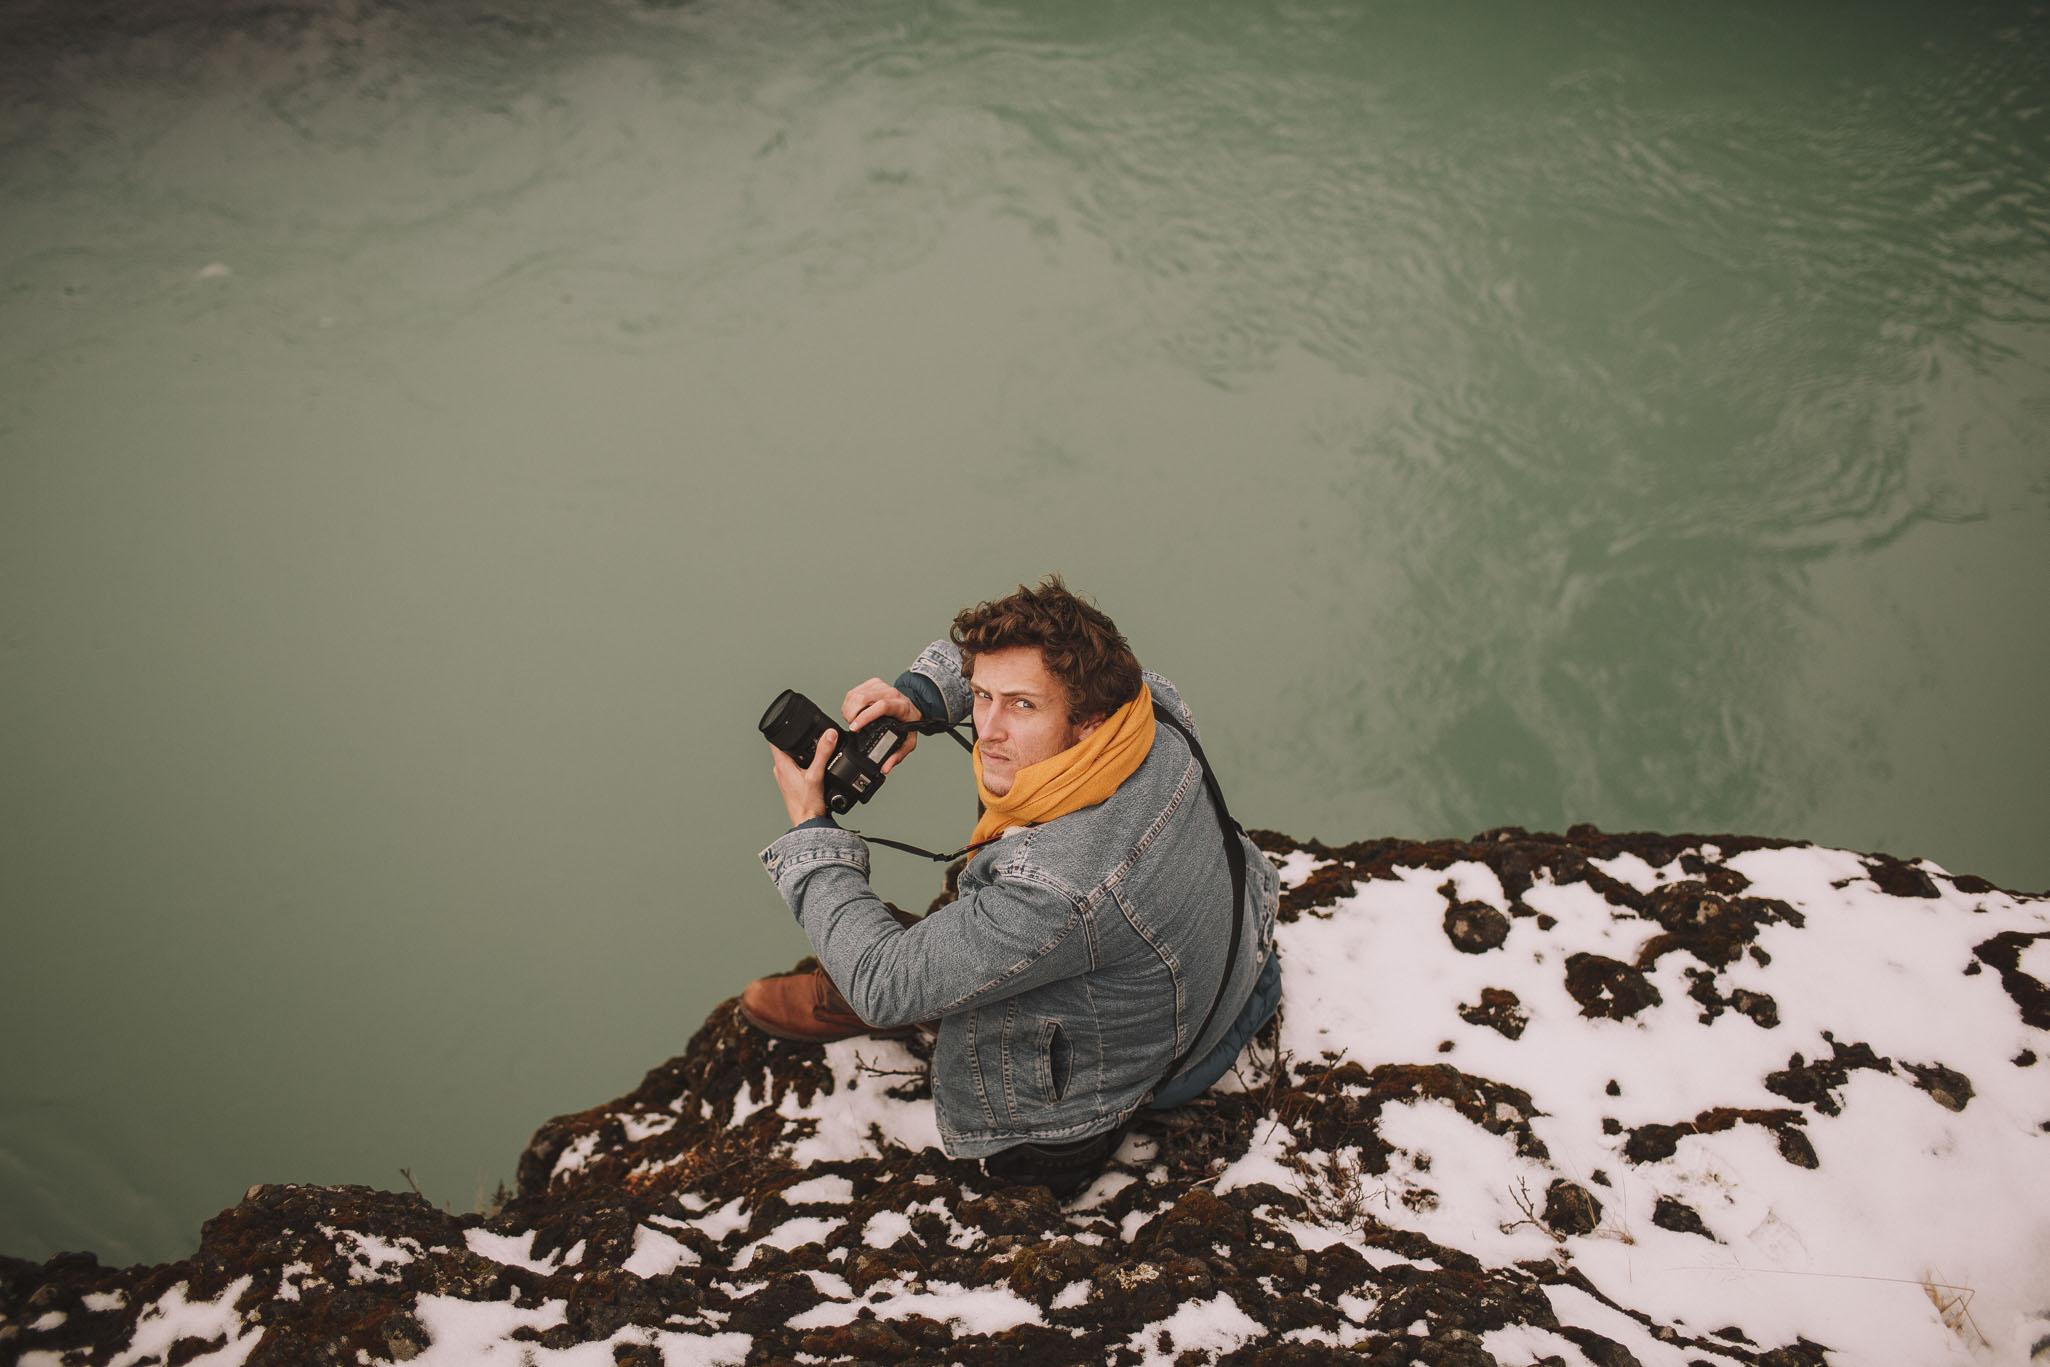 Road-trip-Islande-Iceland-Voyage-Travel-Portrait-Jérémy-Boyer-Geysir-Geysers-Horse-snow-ice-Gullfoss-17.jpg